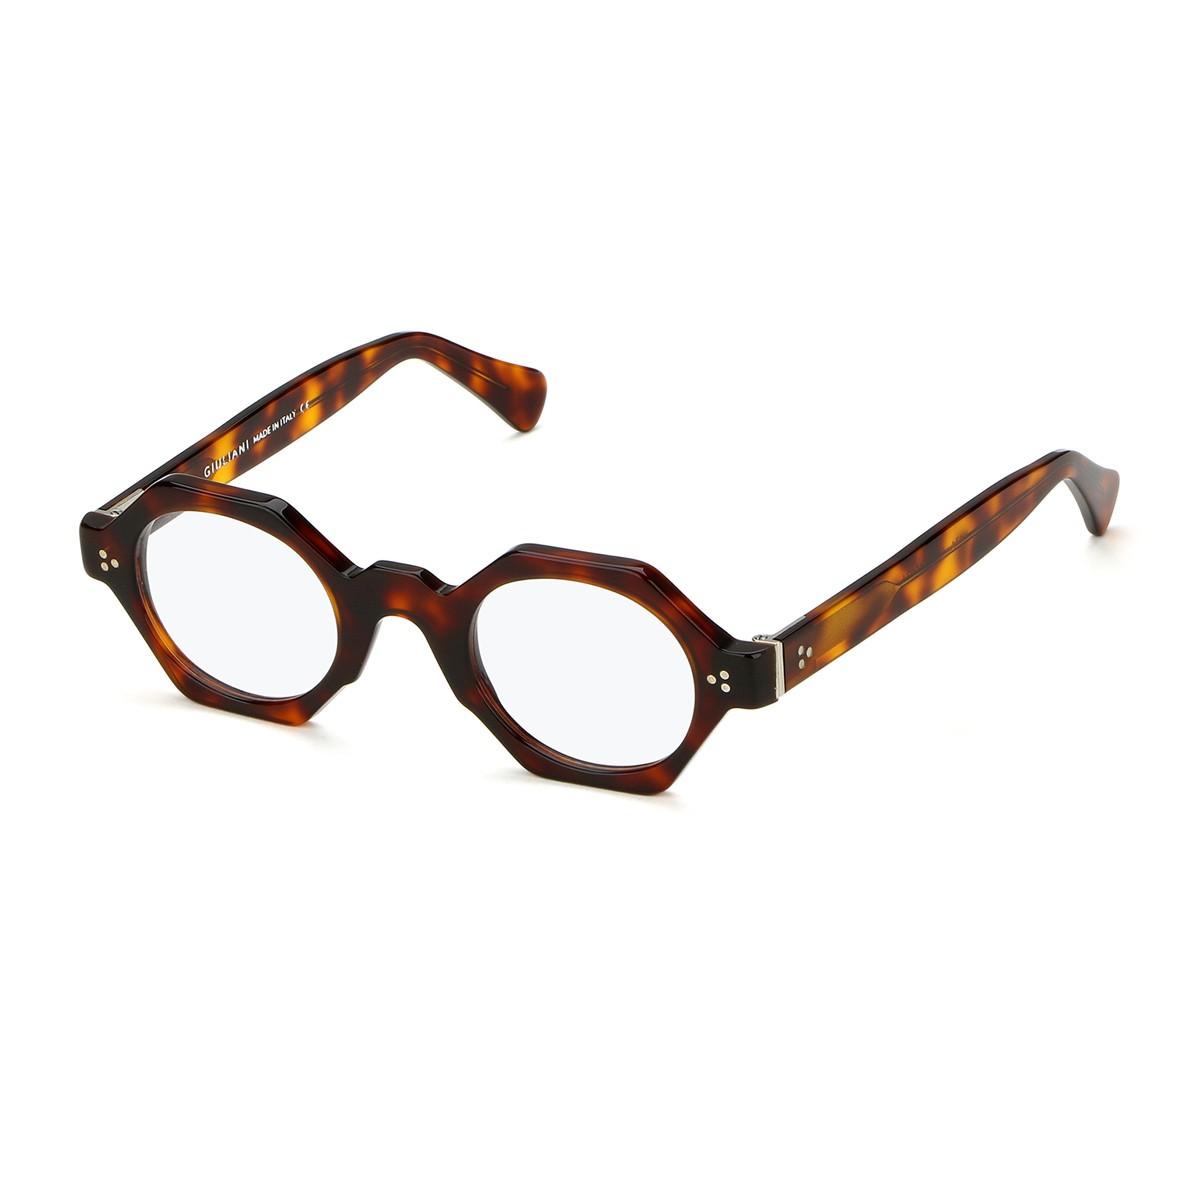 Giuliani H171 | Occhiali da vista Unisex